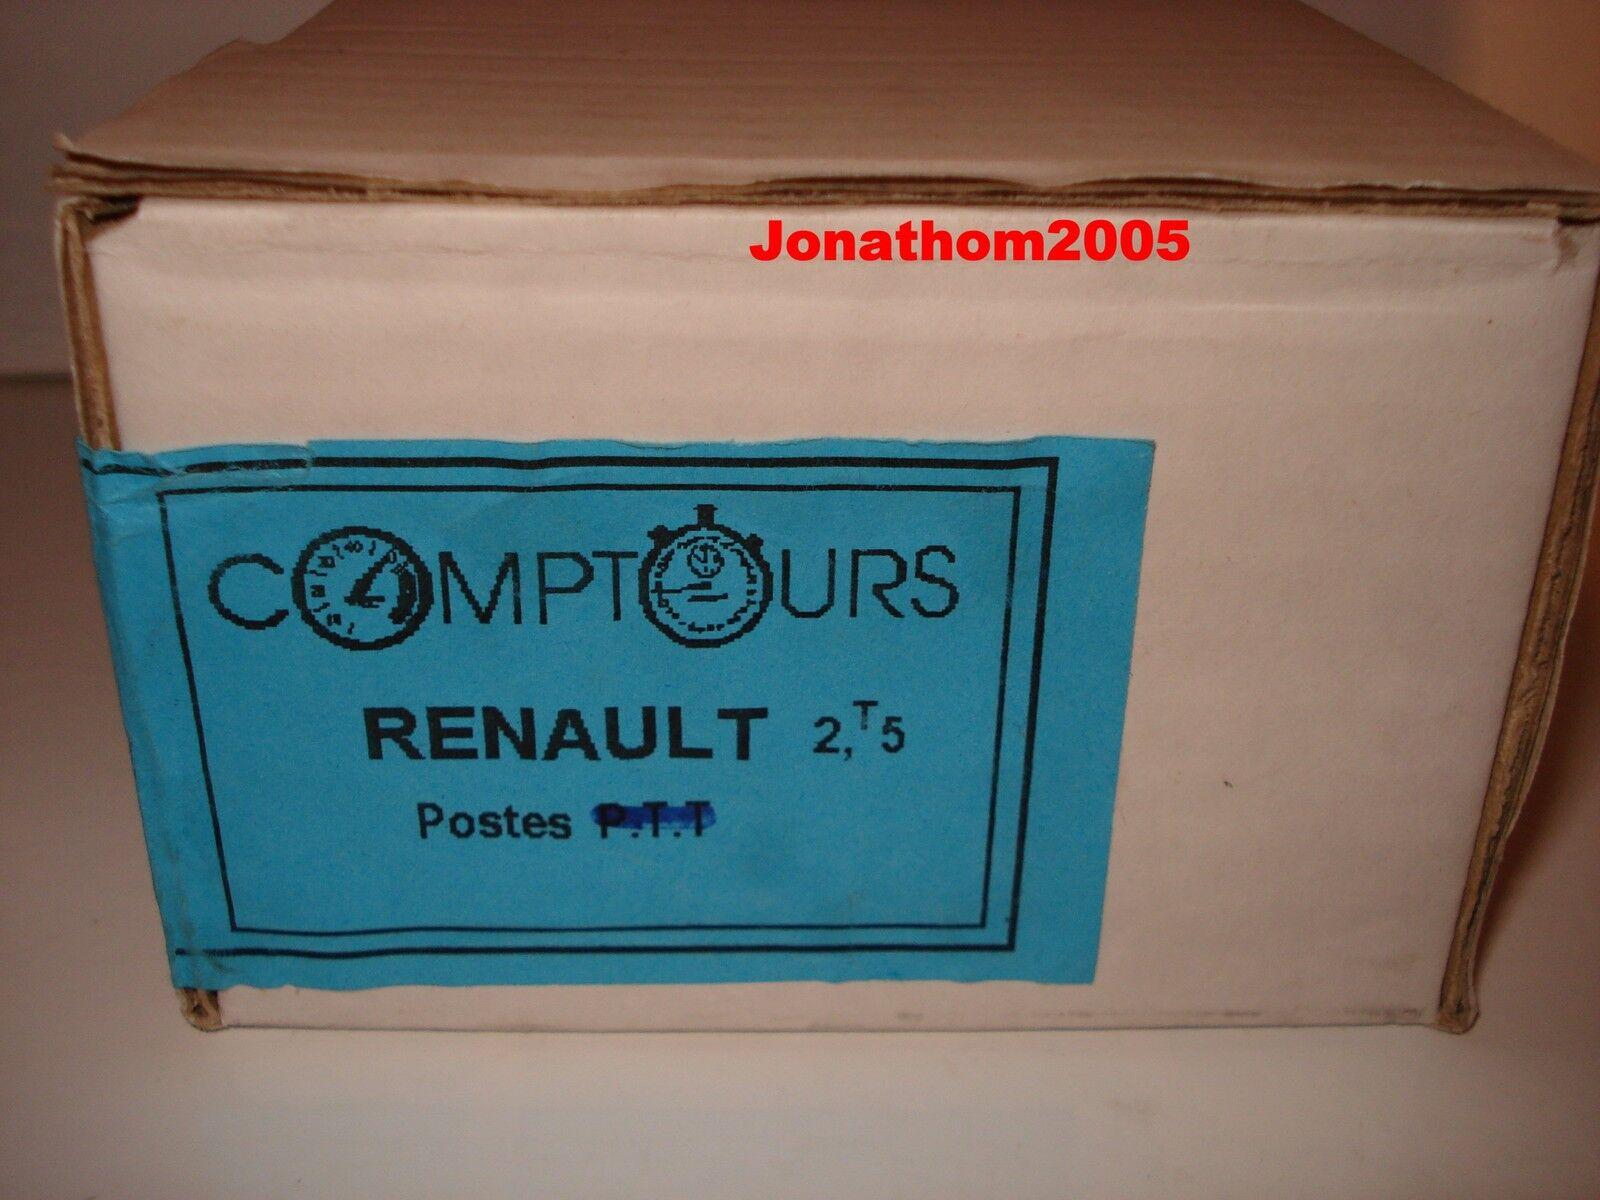 Set Aufbau comptours renault 2T5 Positionen die 1 50° 50° 50° dedaf0